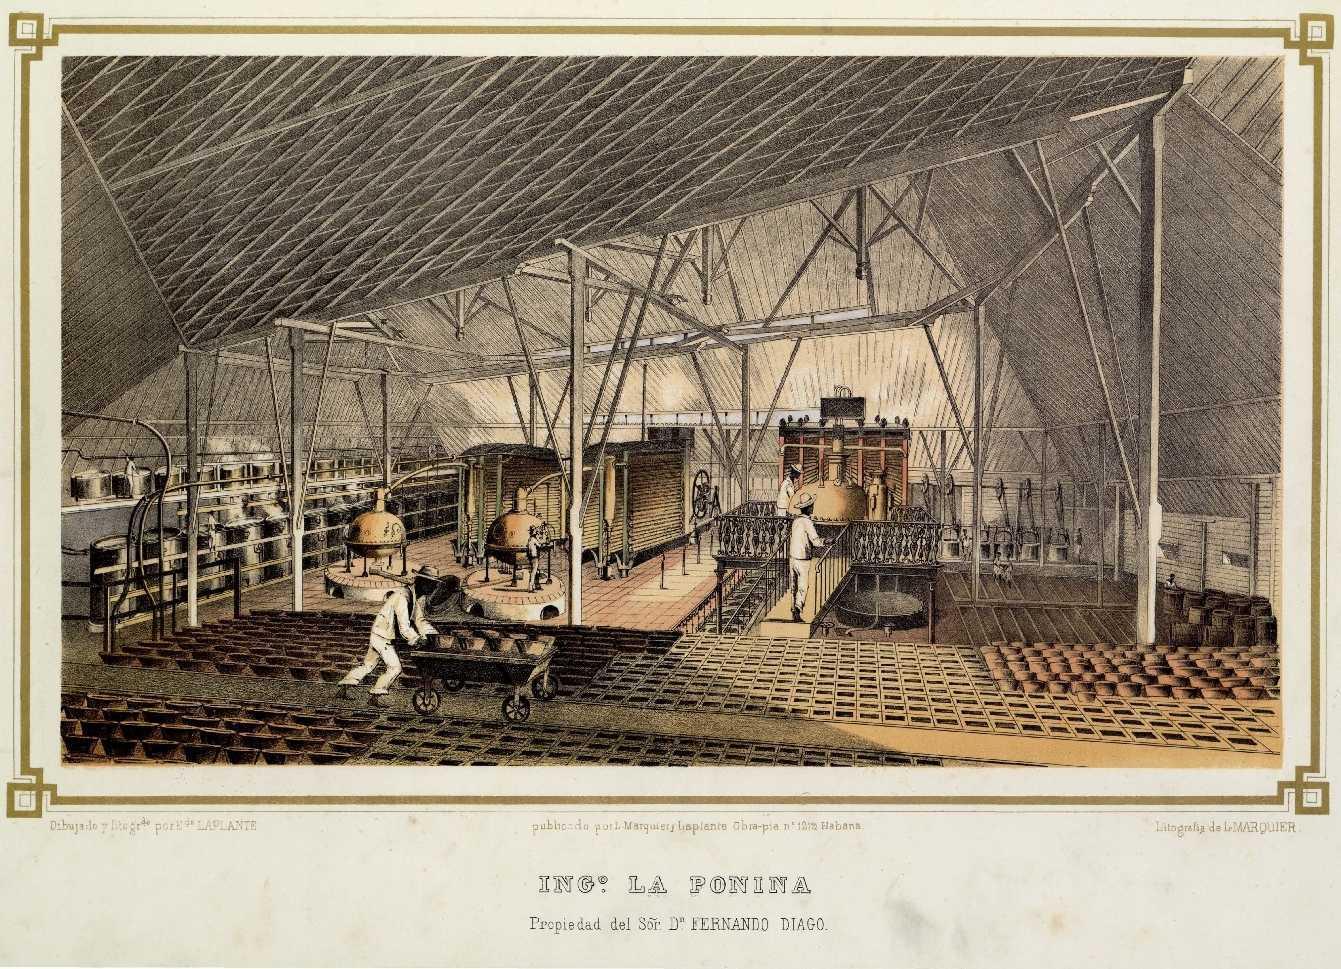 Ingenio La Ponina